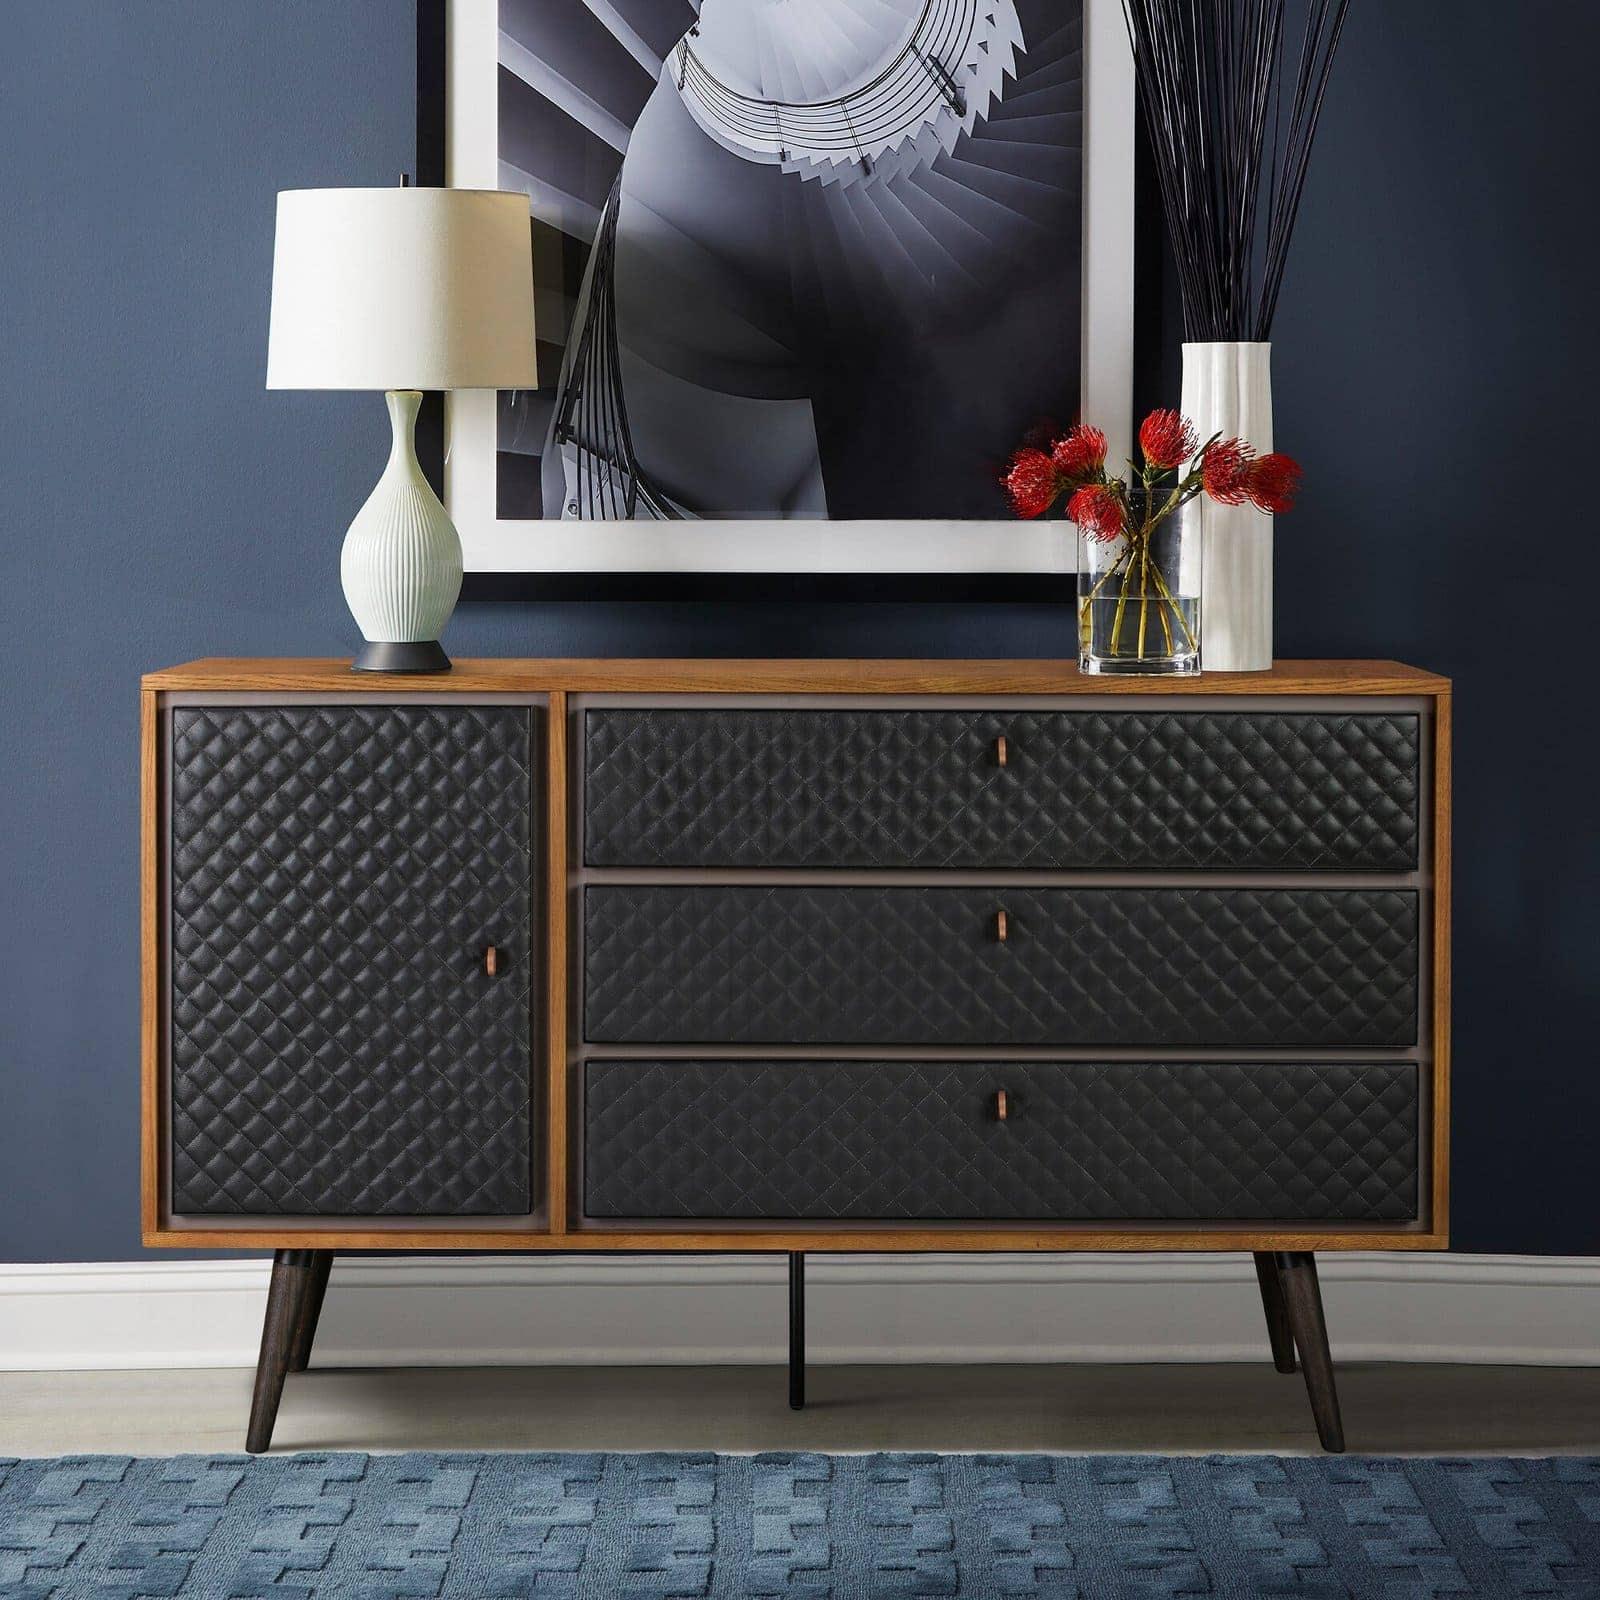 Lindel Coco Oak Wood and Leather Dresser